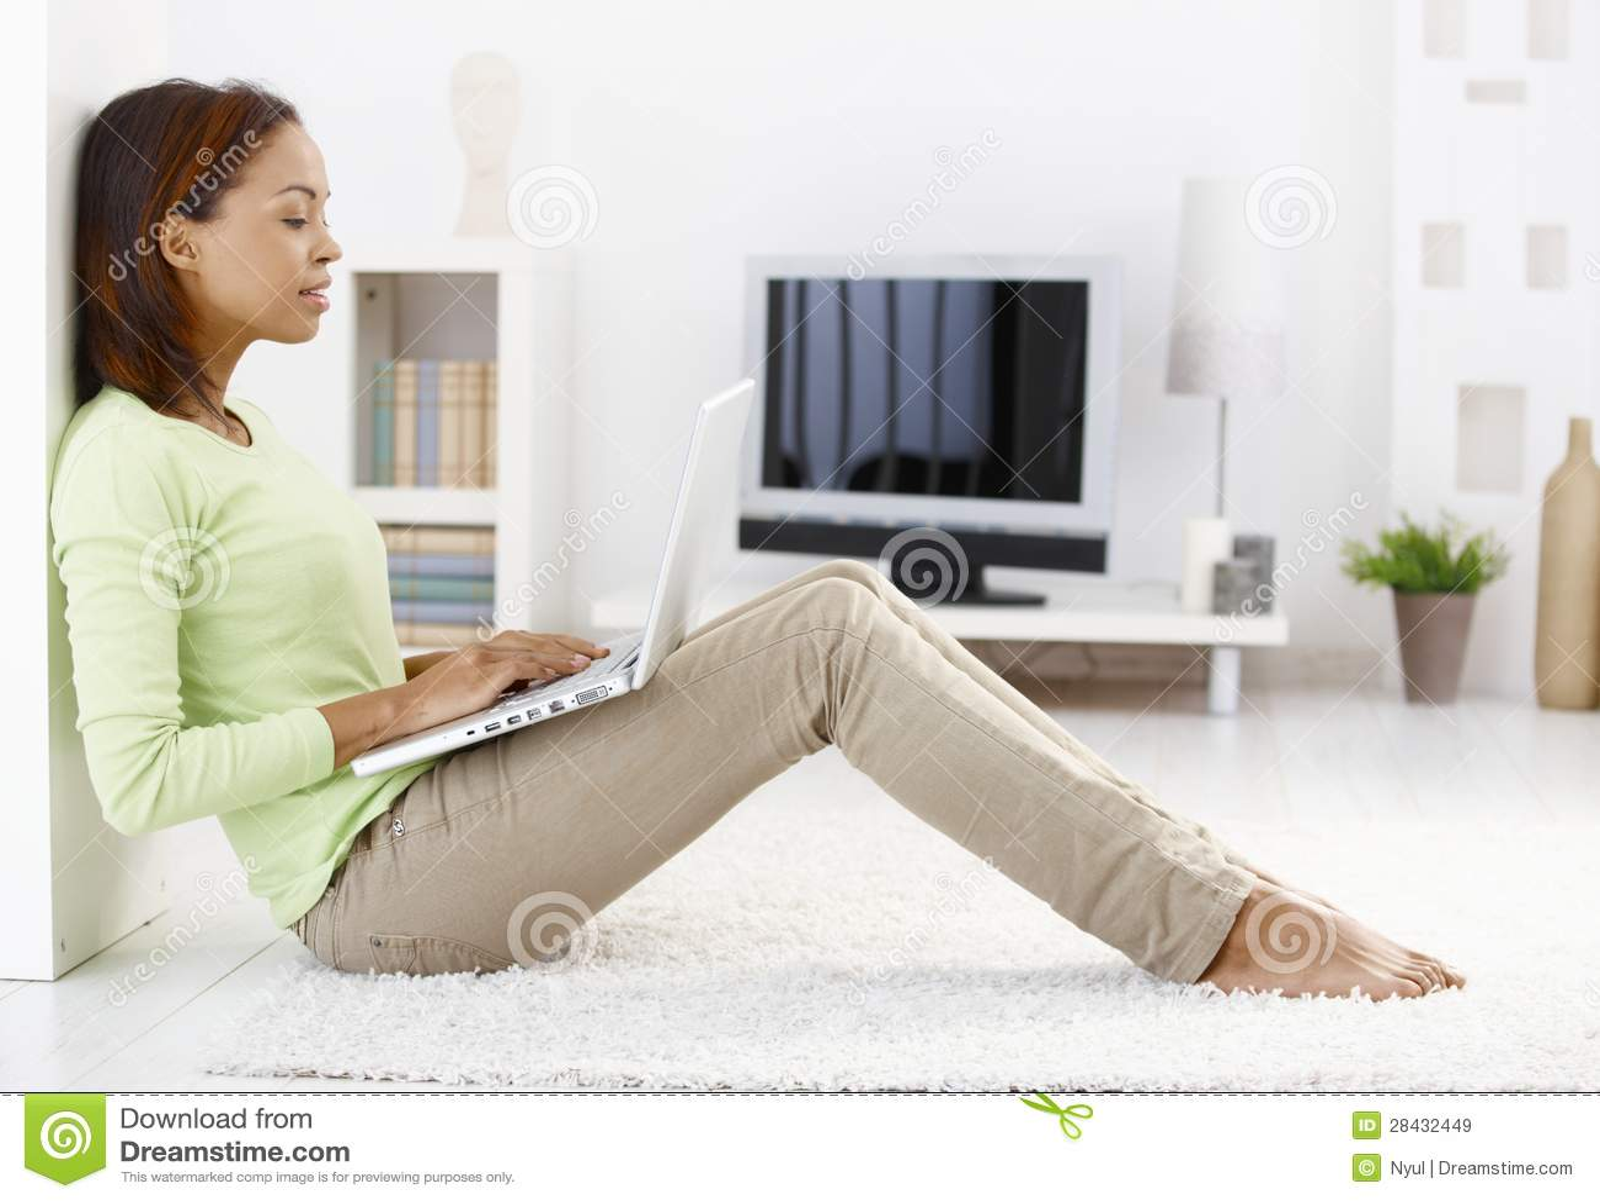 Attractive woman using laptop on floor